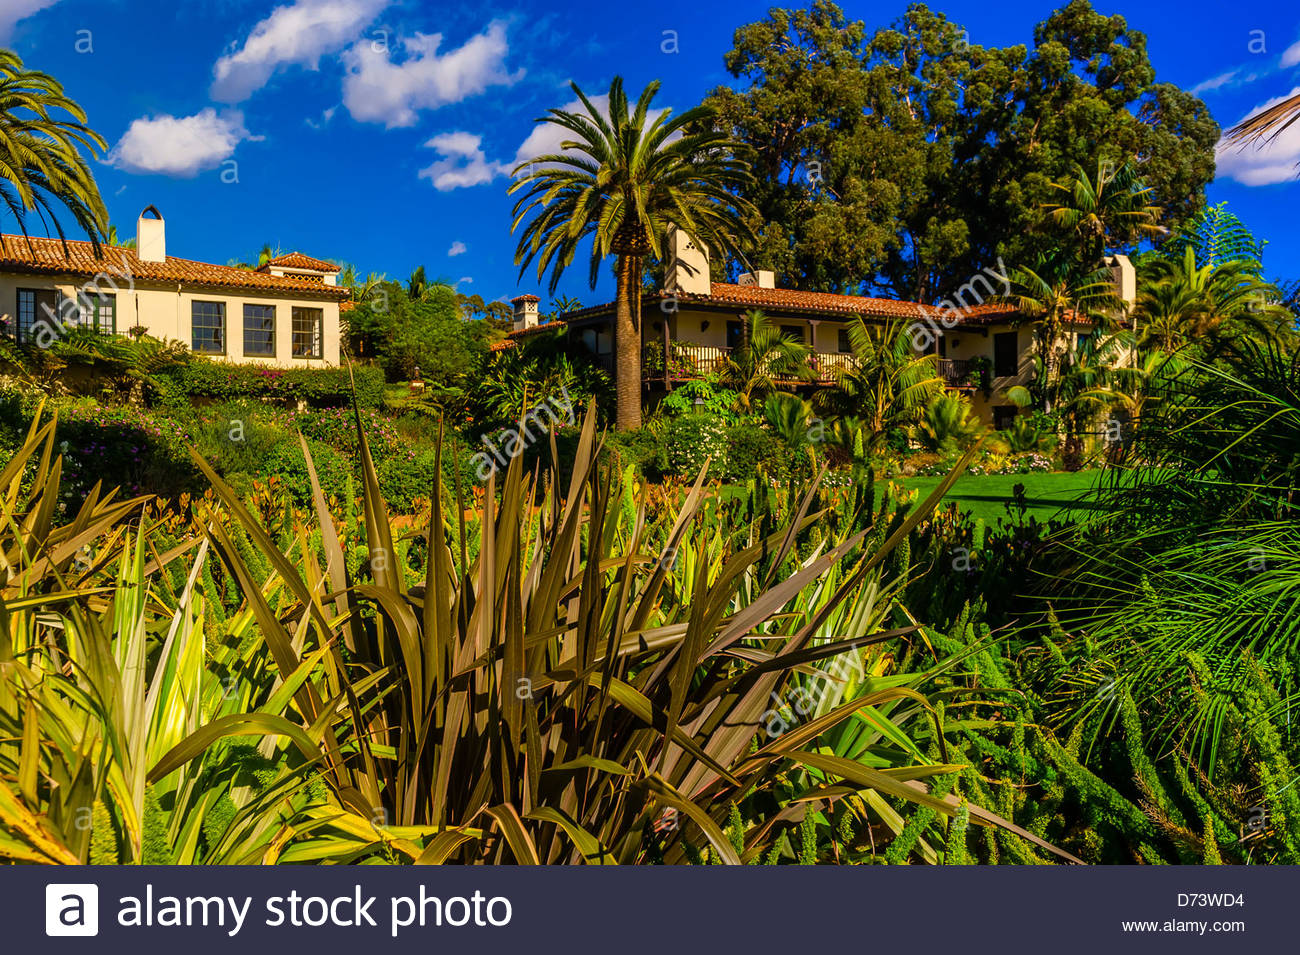 Four Seasons Biltmore Hotel, Montecito (Santa Barbara), California USA. - Stock Image